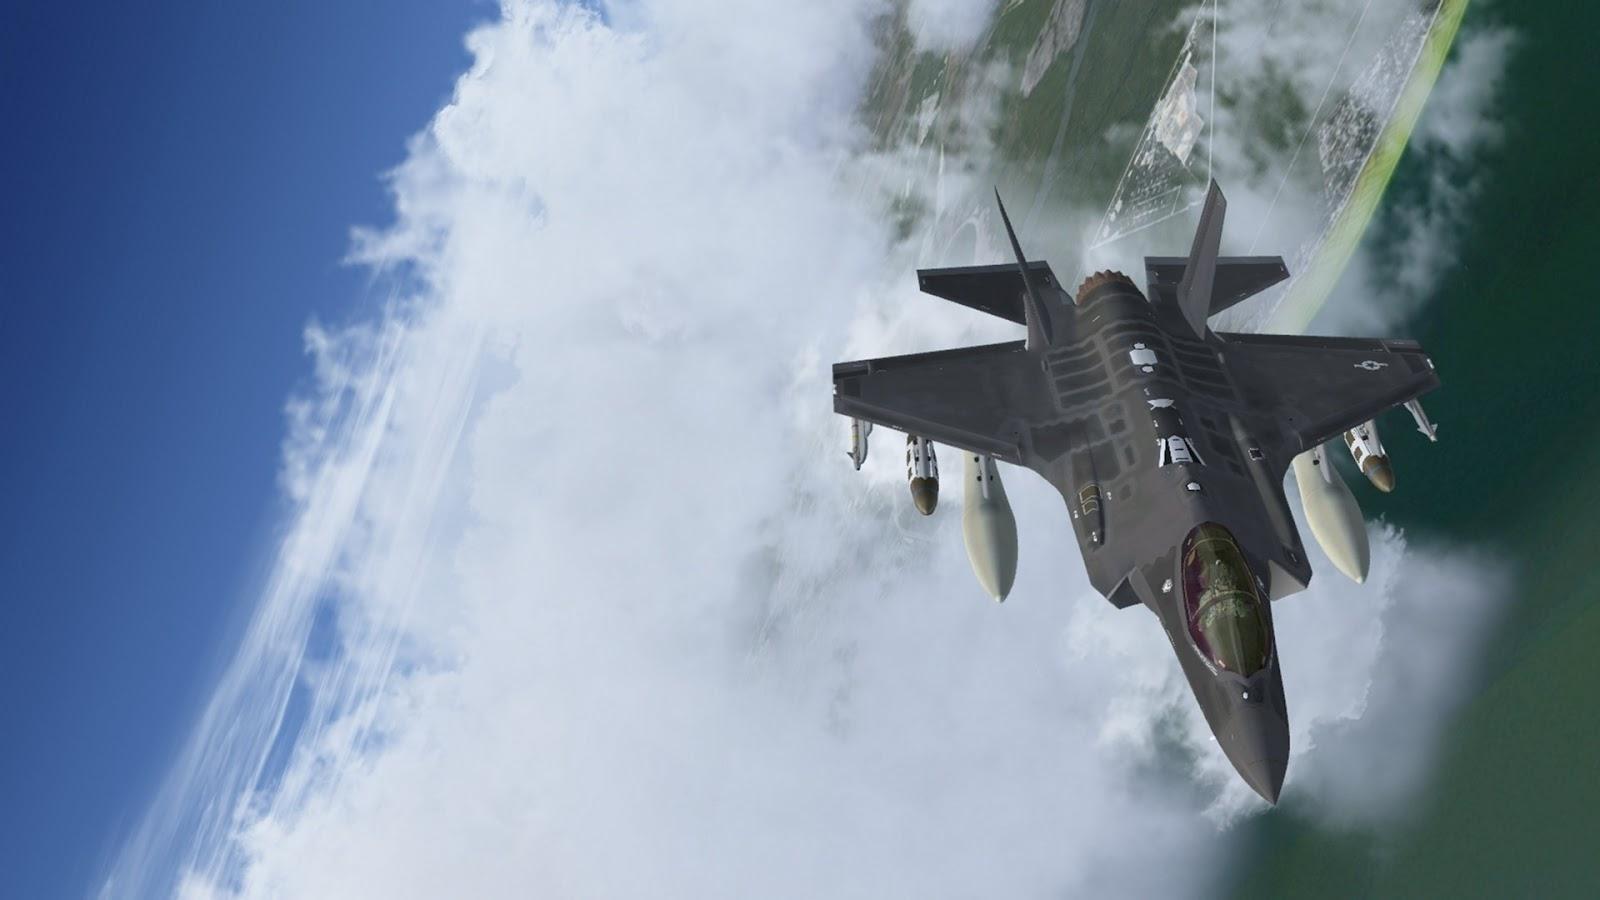 Eglin_F35A_front